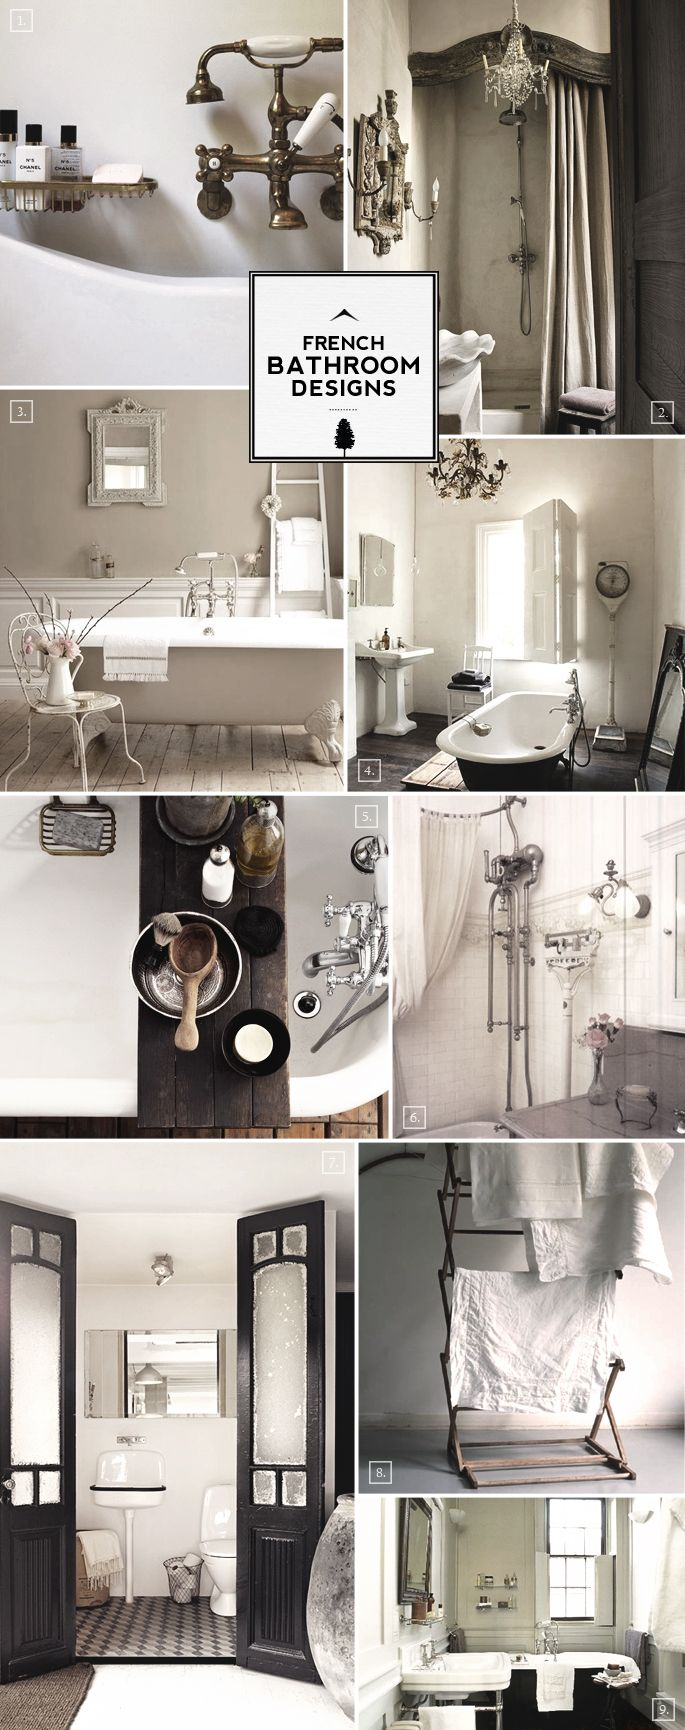 French style bathroom decor and designs bathroom ideas for French bathroom accessories